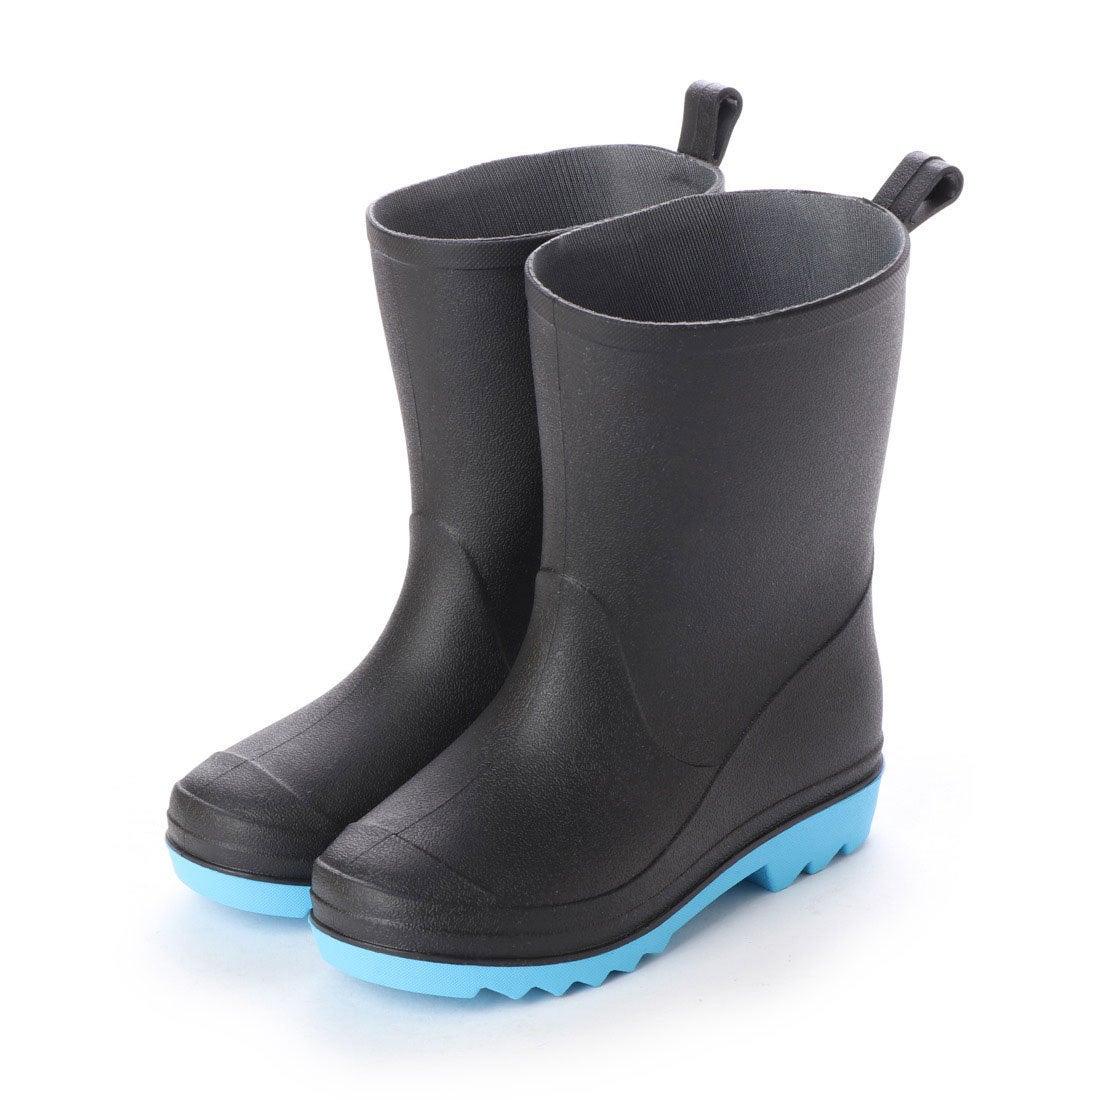 206eb5d4818b6 ケンケンパ KenKenPa ショート丈 軽量レインブーツ (ブラック) -靴&ファッション通販 ロコンド〜自宅で試着、気軽に返品